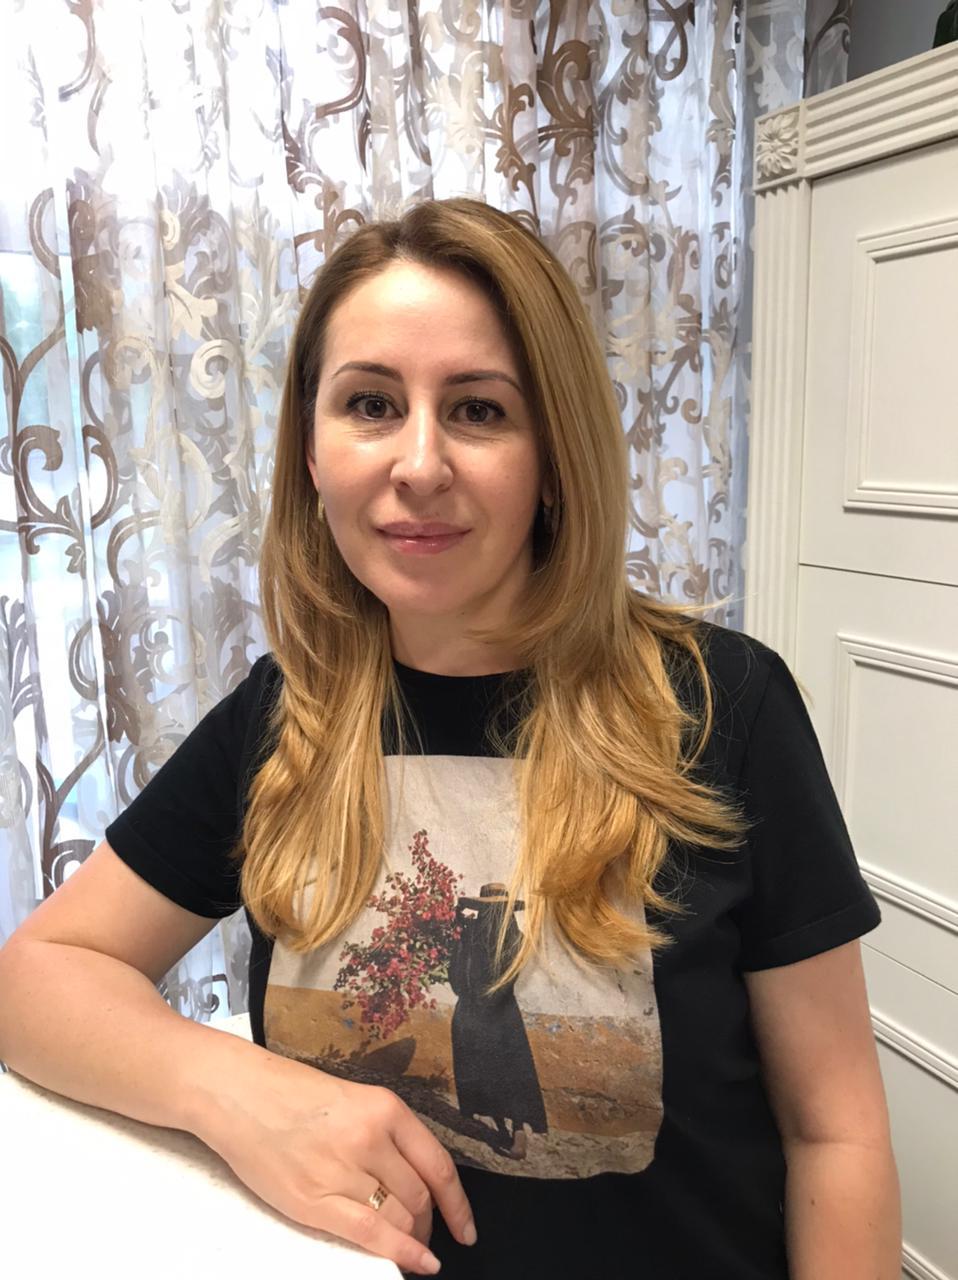 Рамазанова Зара - парикмахер-стилист